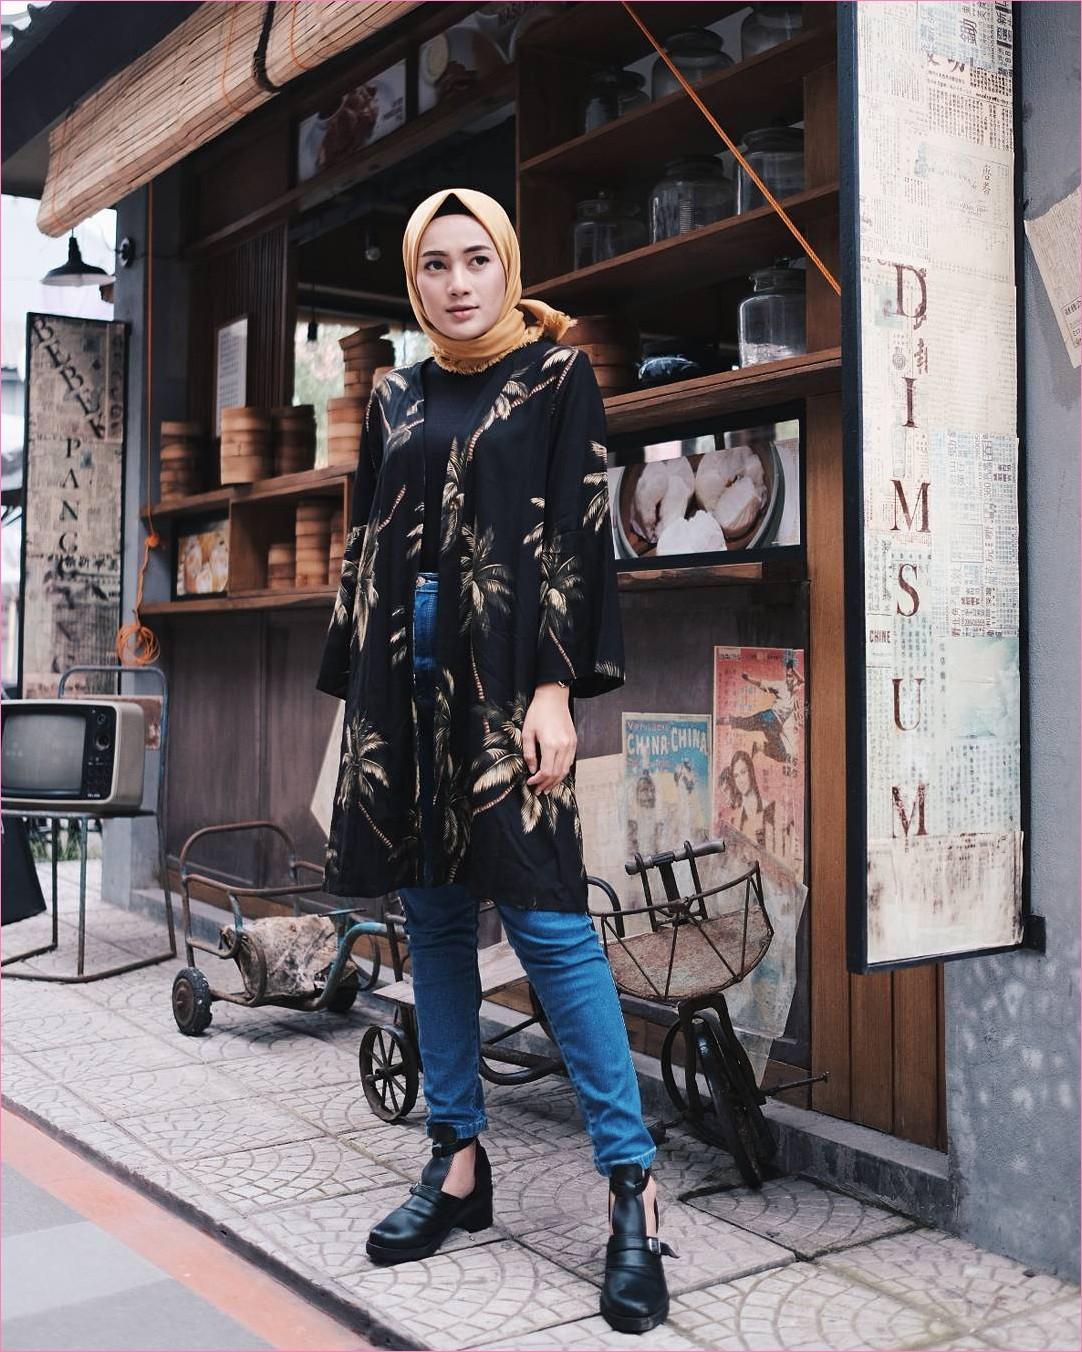 Outfit Baju Hijab Casual Untuk Perempuan Gemuk Ala Selebgram 2018 hijab square kuning emas ciput mangset outer bermotif pohon kelapa high heels boots hitam jeans denin biru tua jam tangan gaya casual kain katun sutra rayon ootd outfit 2018 selebgram toples kaca kayu dimsum pot warung lampu sepedah